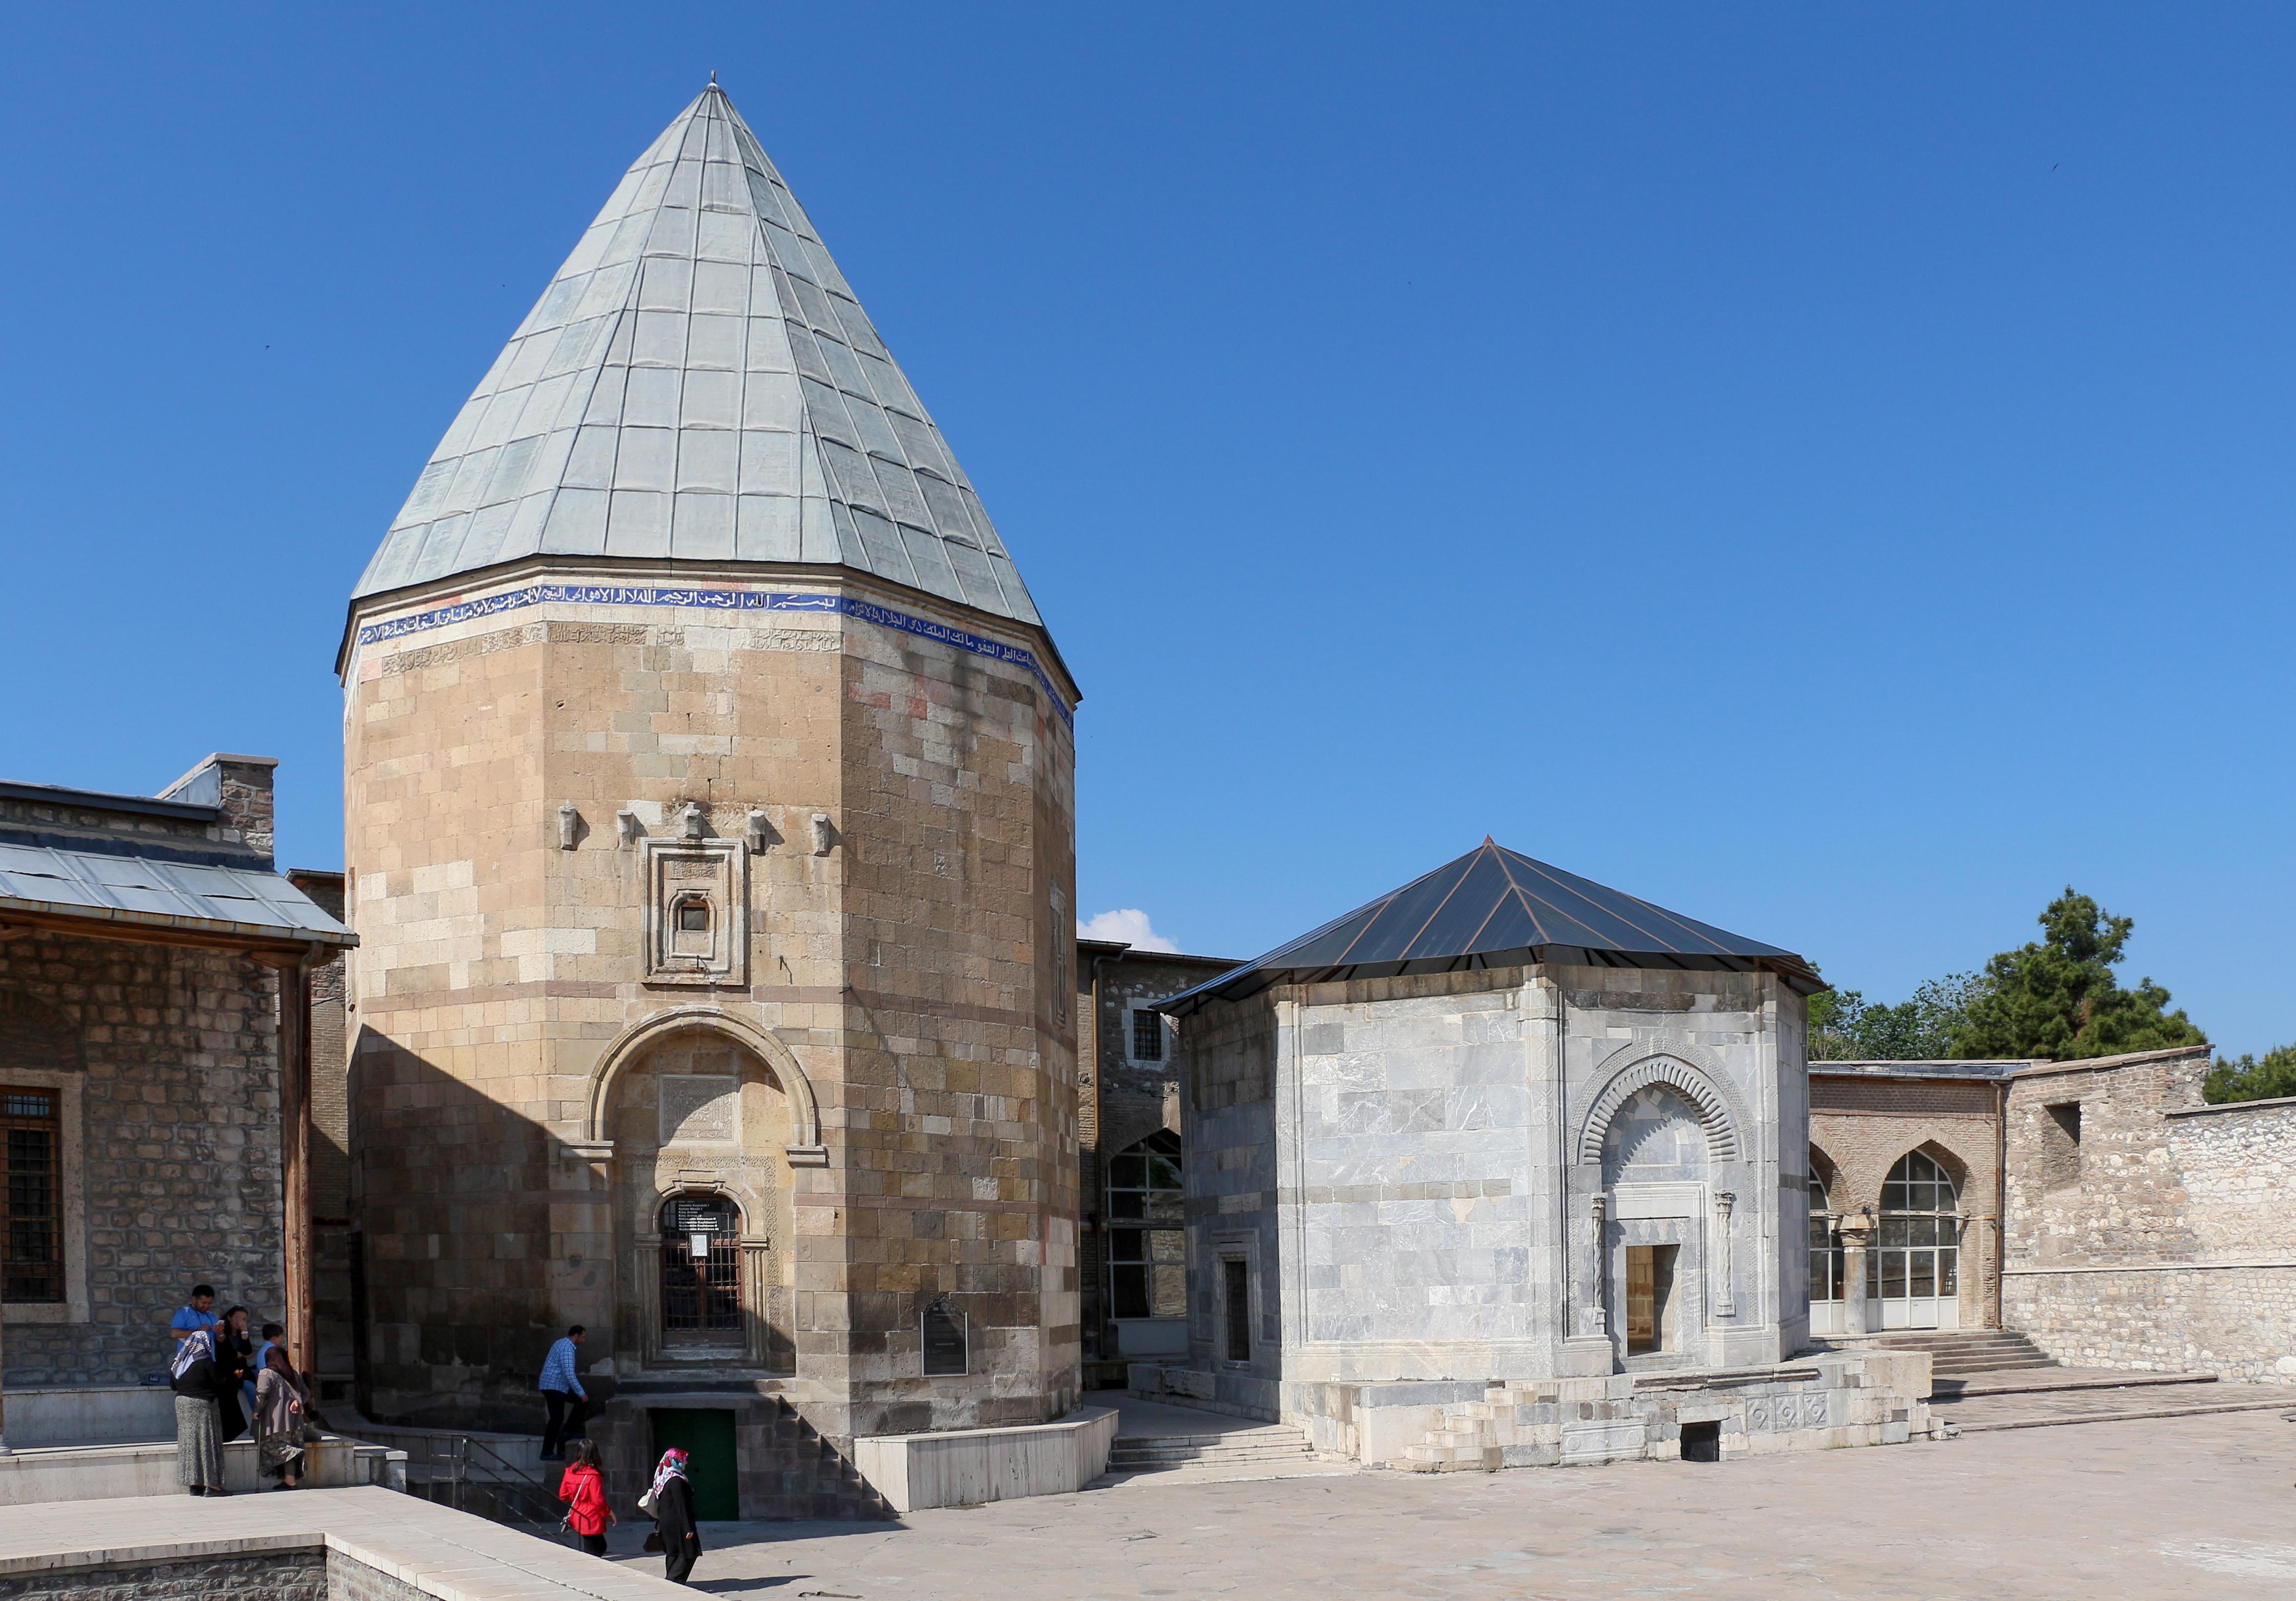 File:Alâeddin Mosque, Konya 01.jpg - Wikimedia Commons